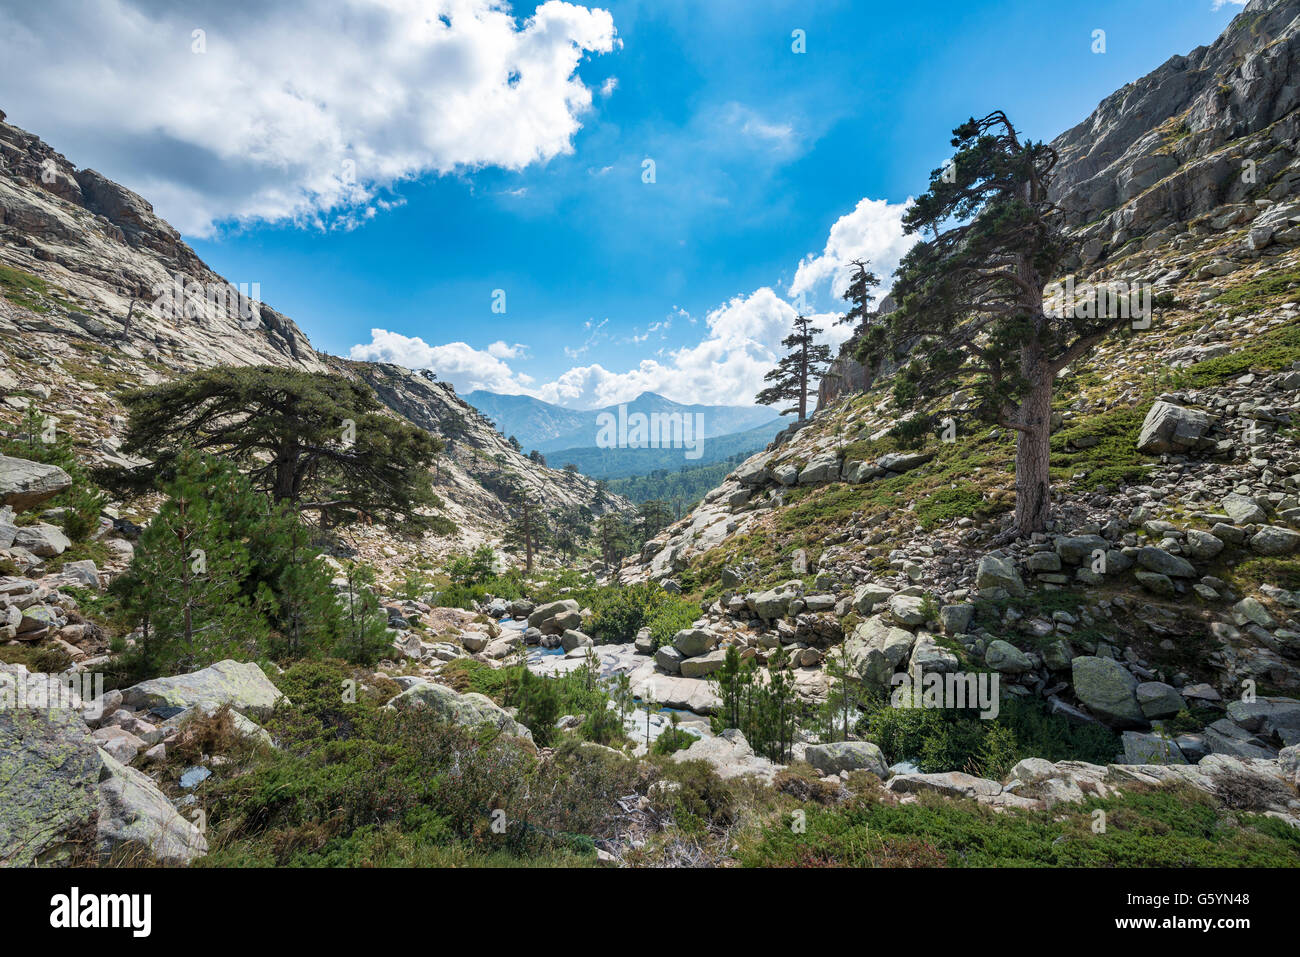 Berglandschaft in Golo Tal, Natur Naturpark von Korsika, Parc Naturel Régional de Corse, Korsika, Frankreich Stockbild